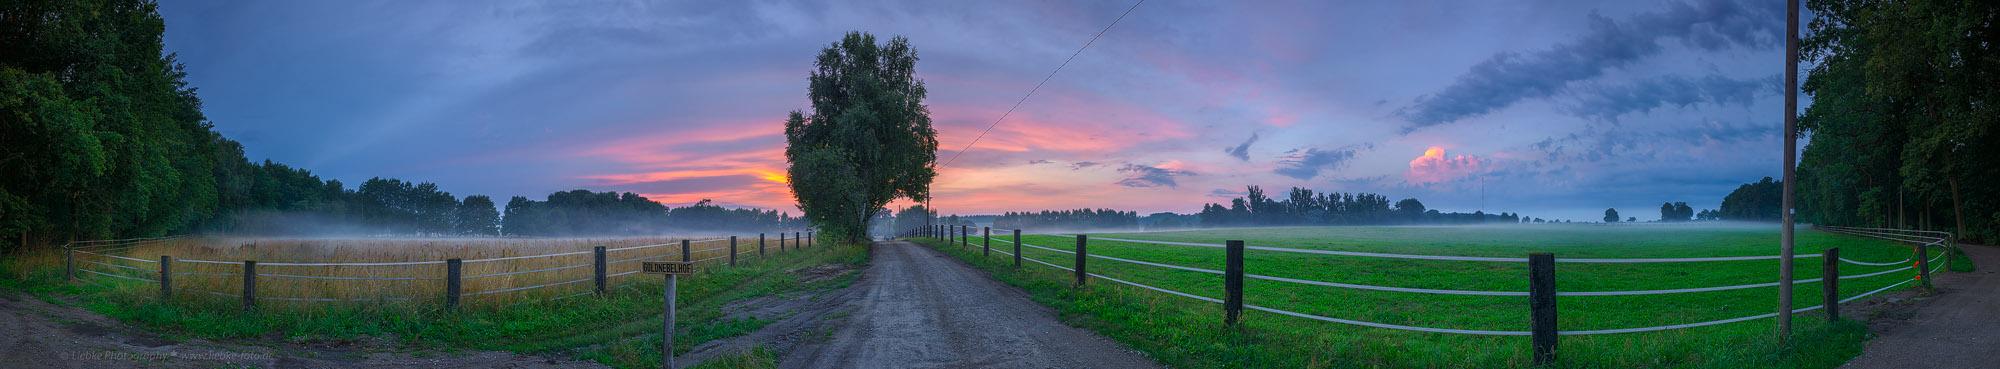 Abendrot und Nebel am Goldnebelhof; Oberhavel